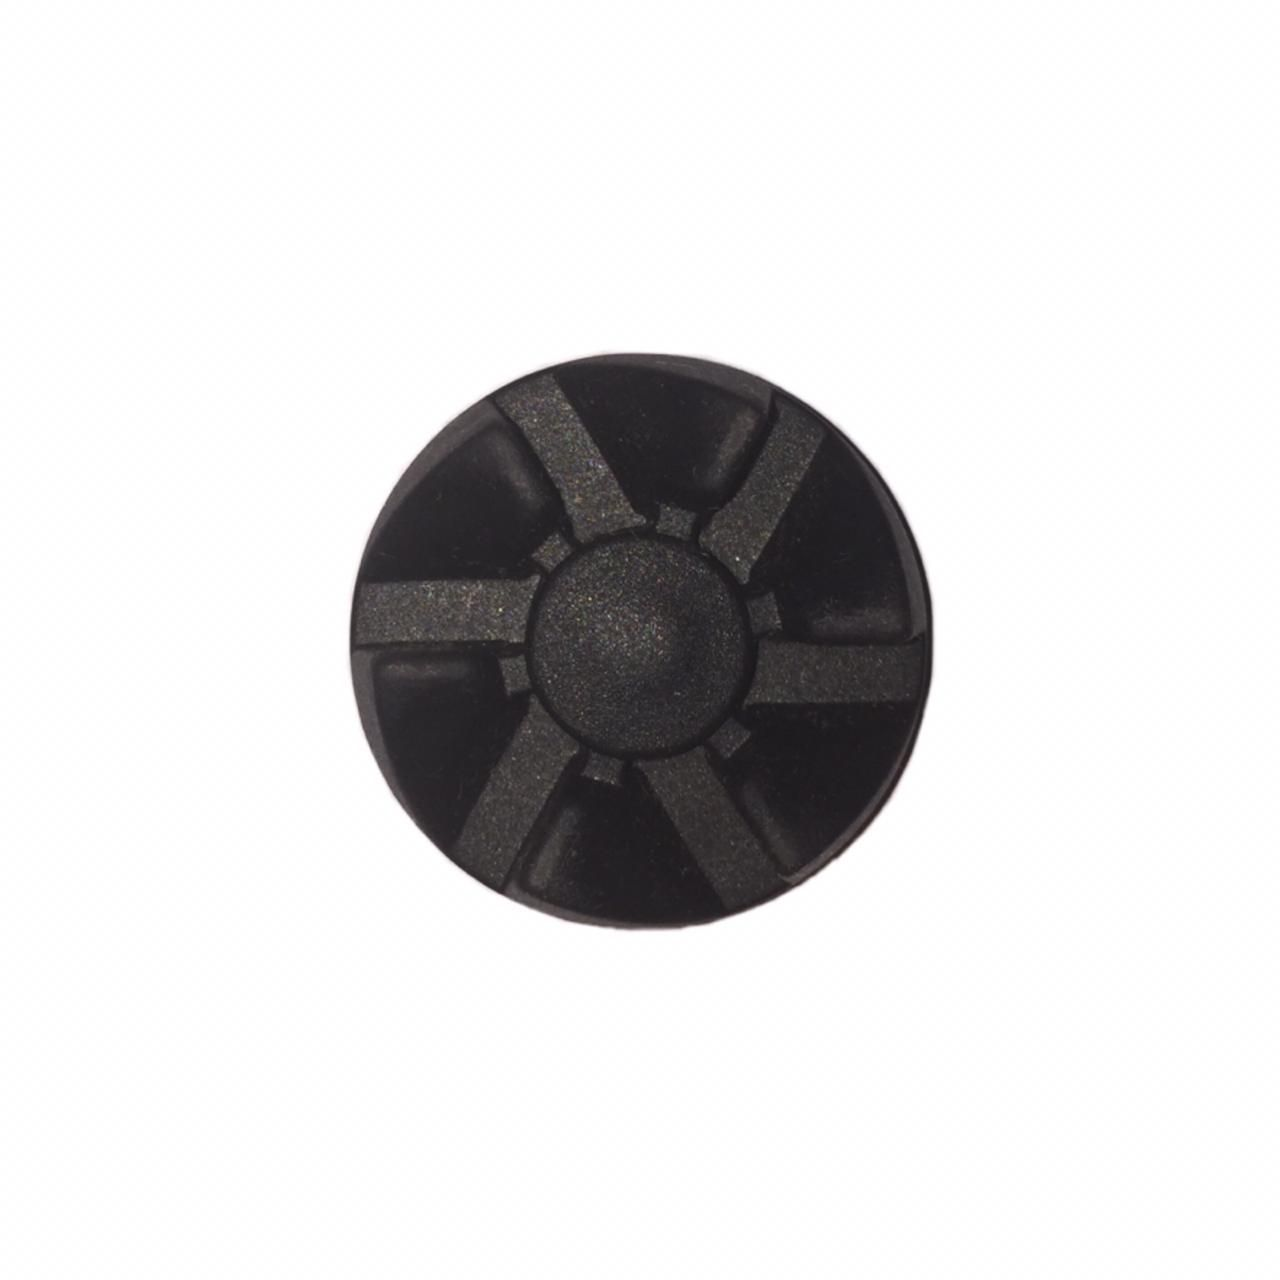 ROTOR PLAST LI8017 (637201)